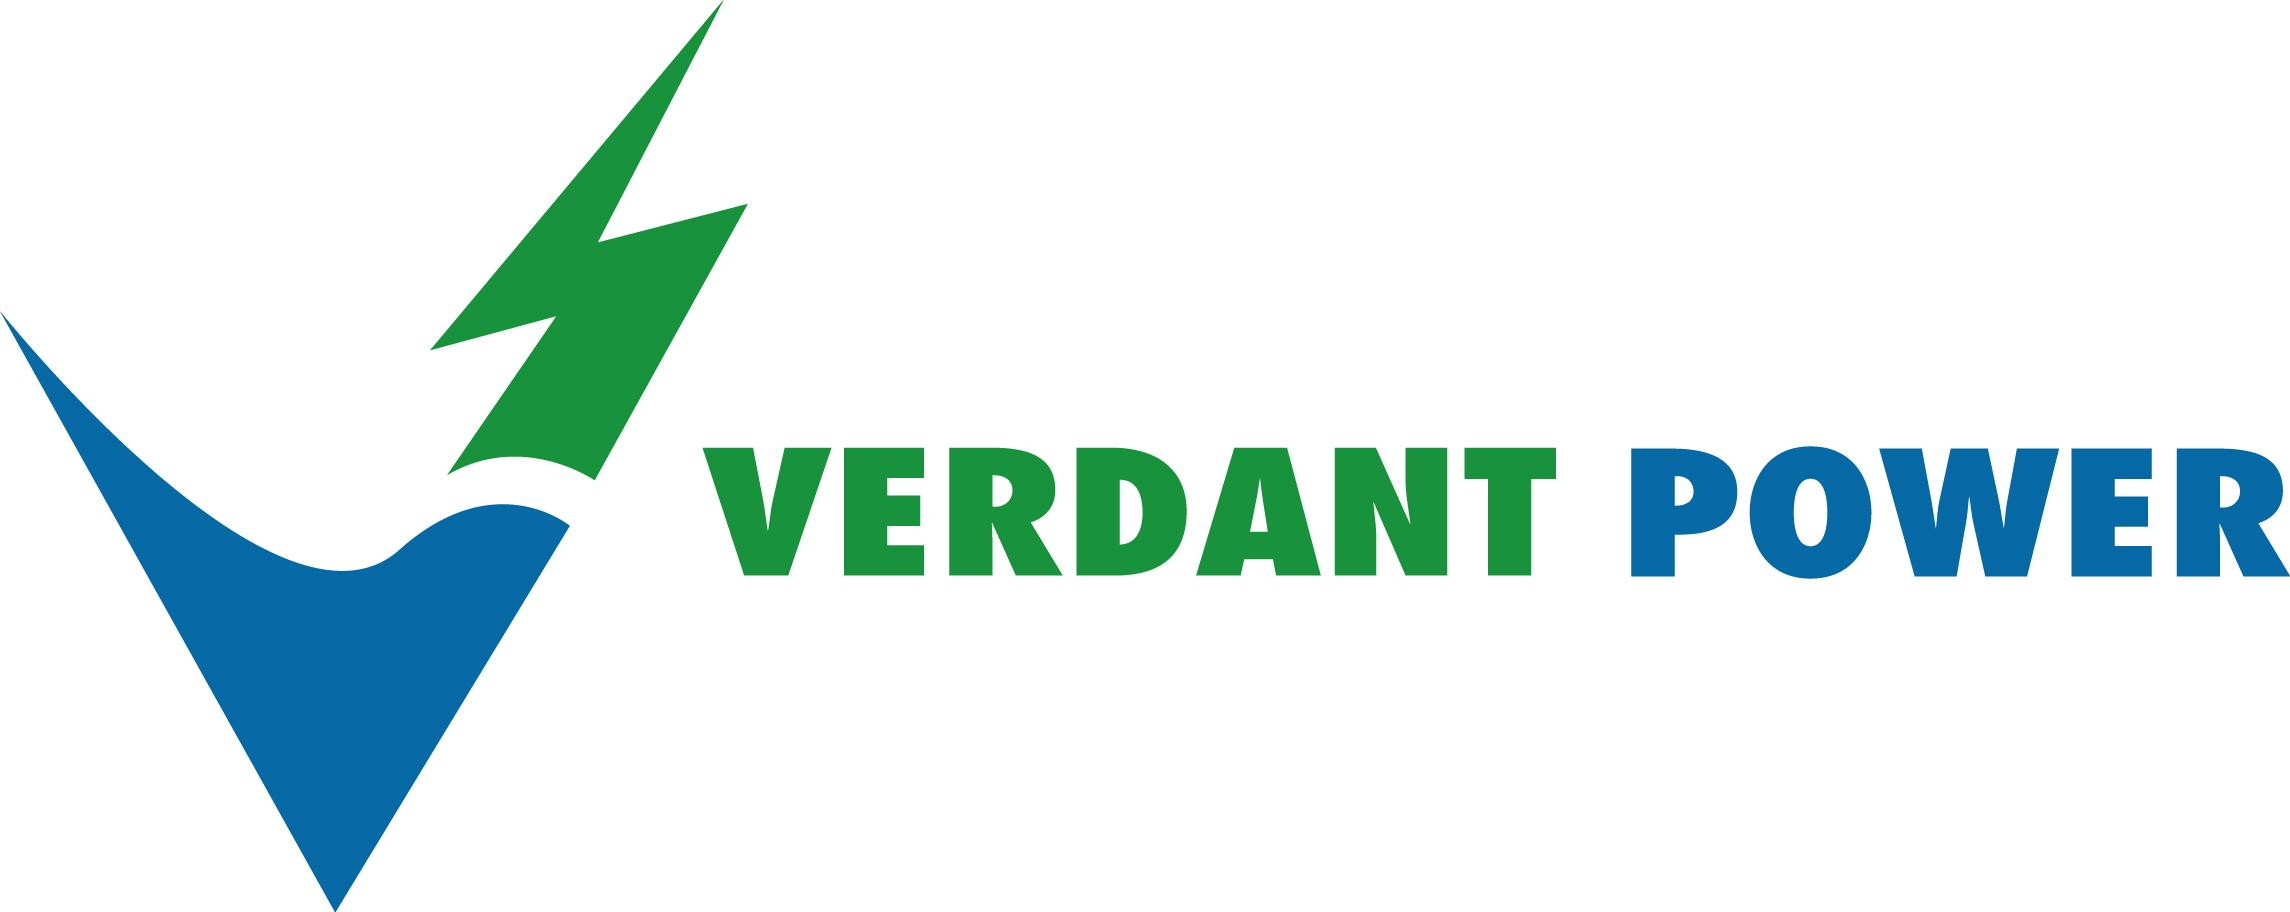 Verdant Power Progresses toward an Autumn Installation of Tidal Energy Turbines in New York City's East River